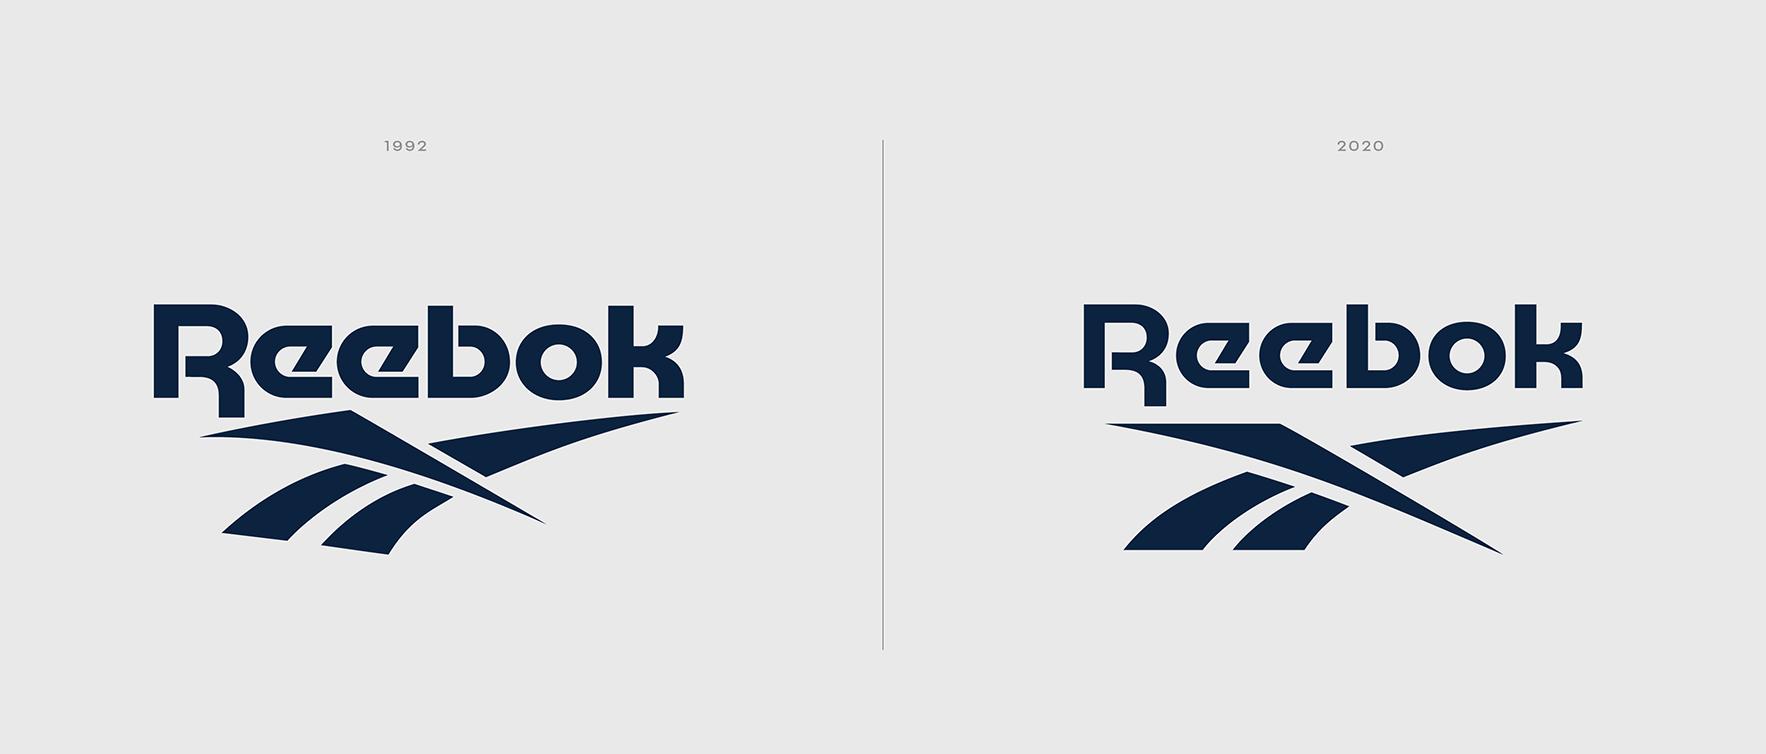 reebok_2019_logo_before_after_original